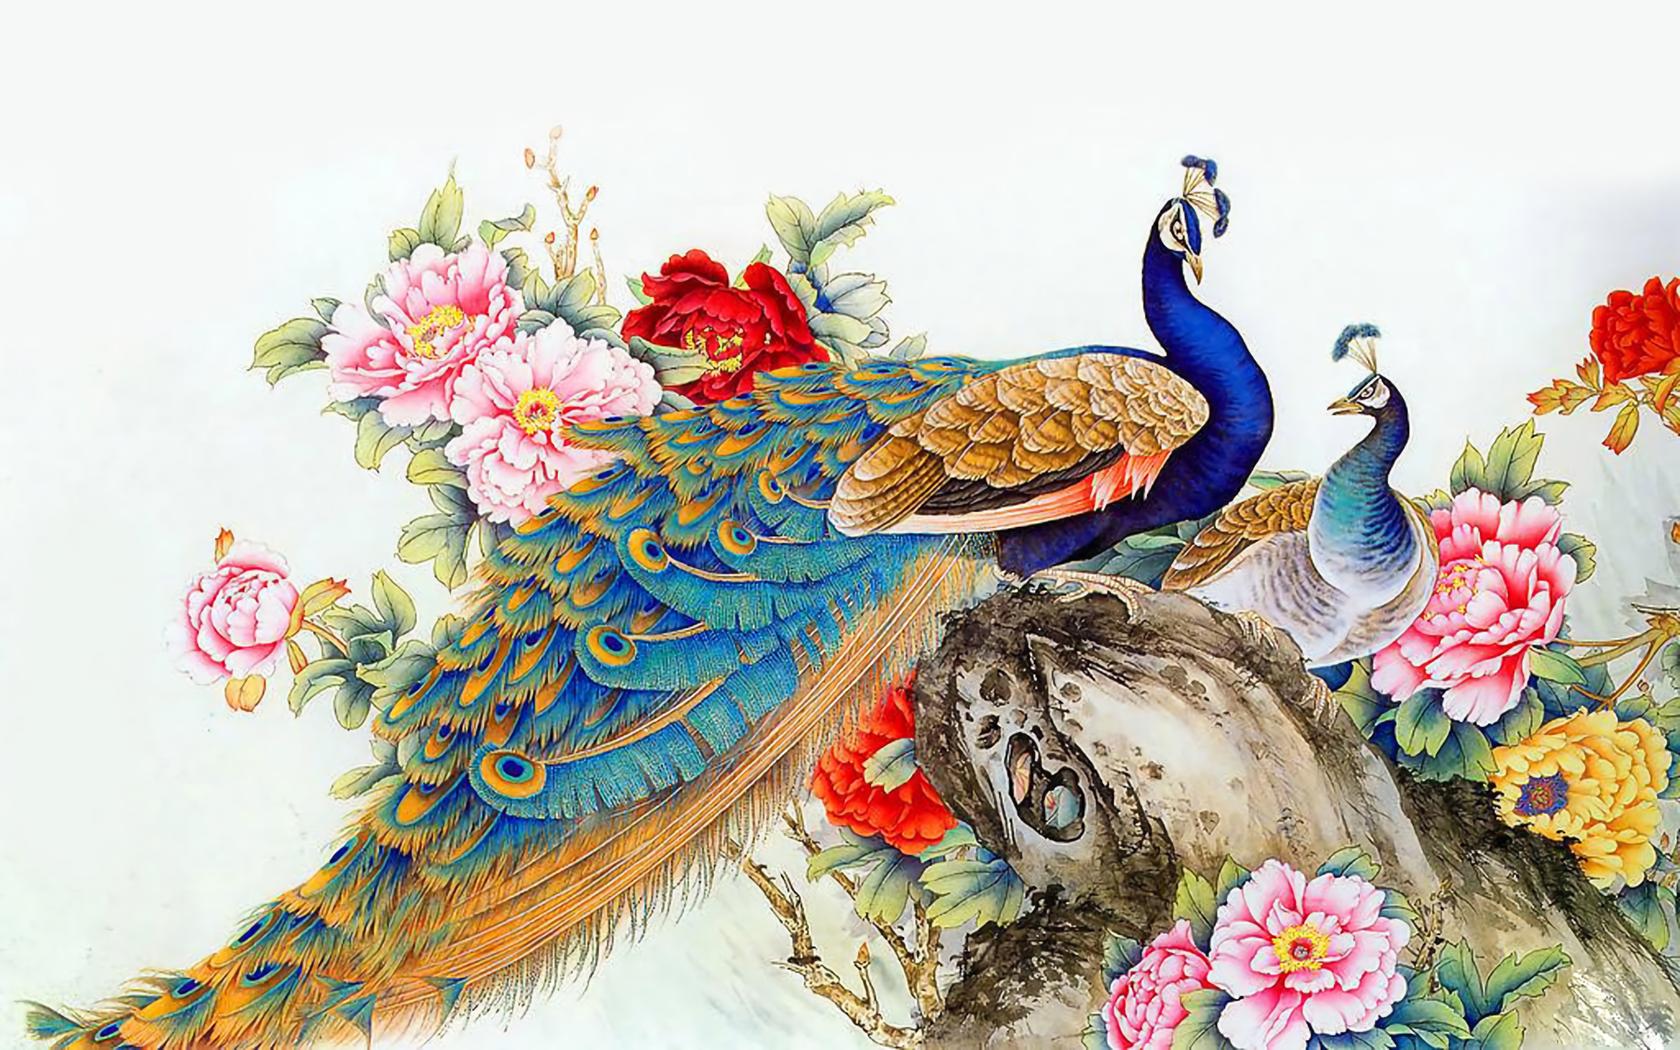 Peacock Art Photography Wallpaper Hq Backgrounds: Peacock Art Wallpaper And Background Image